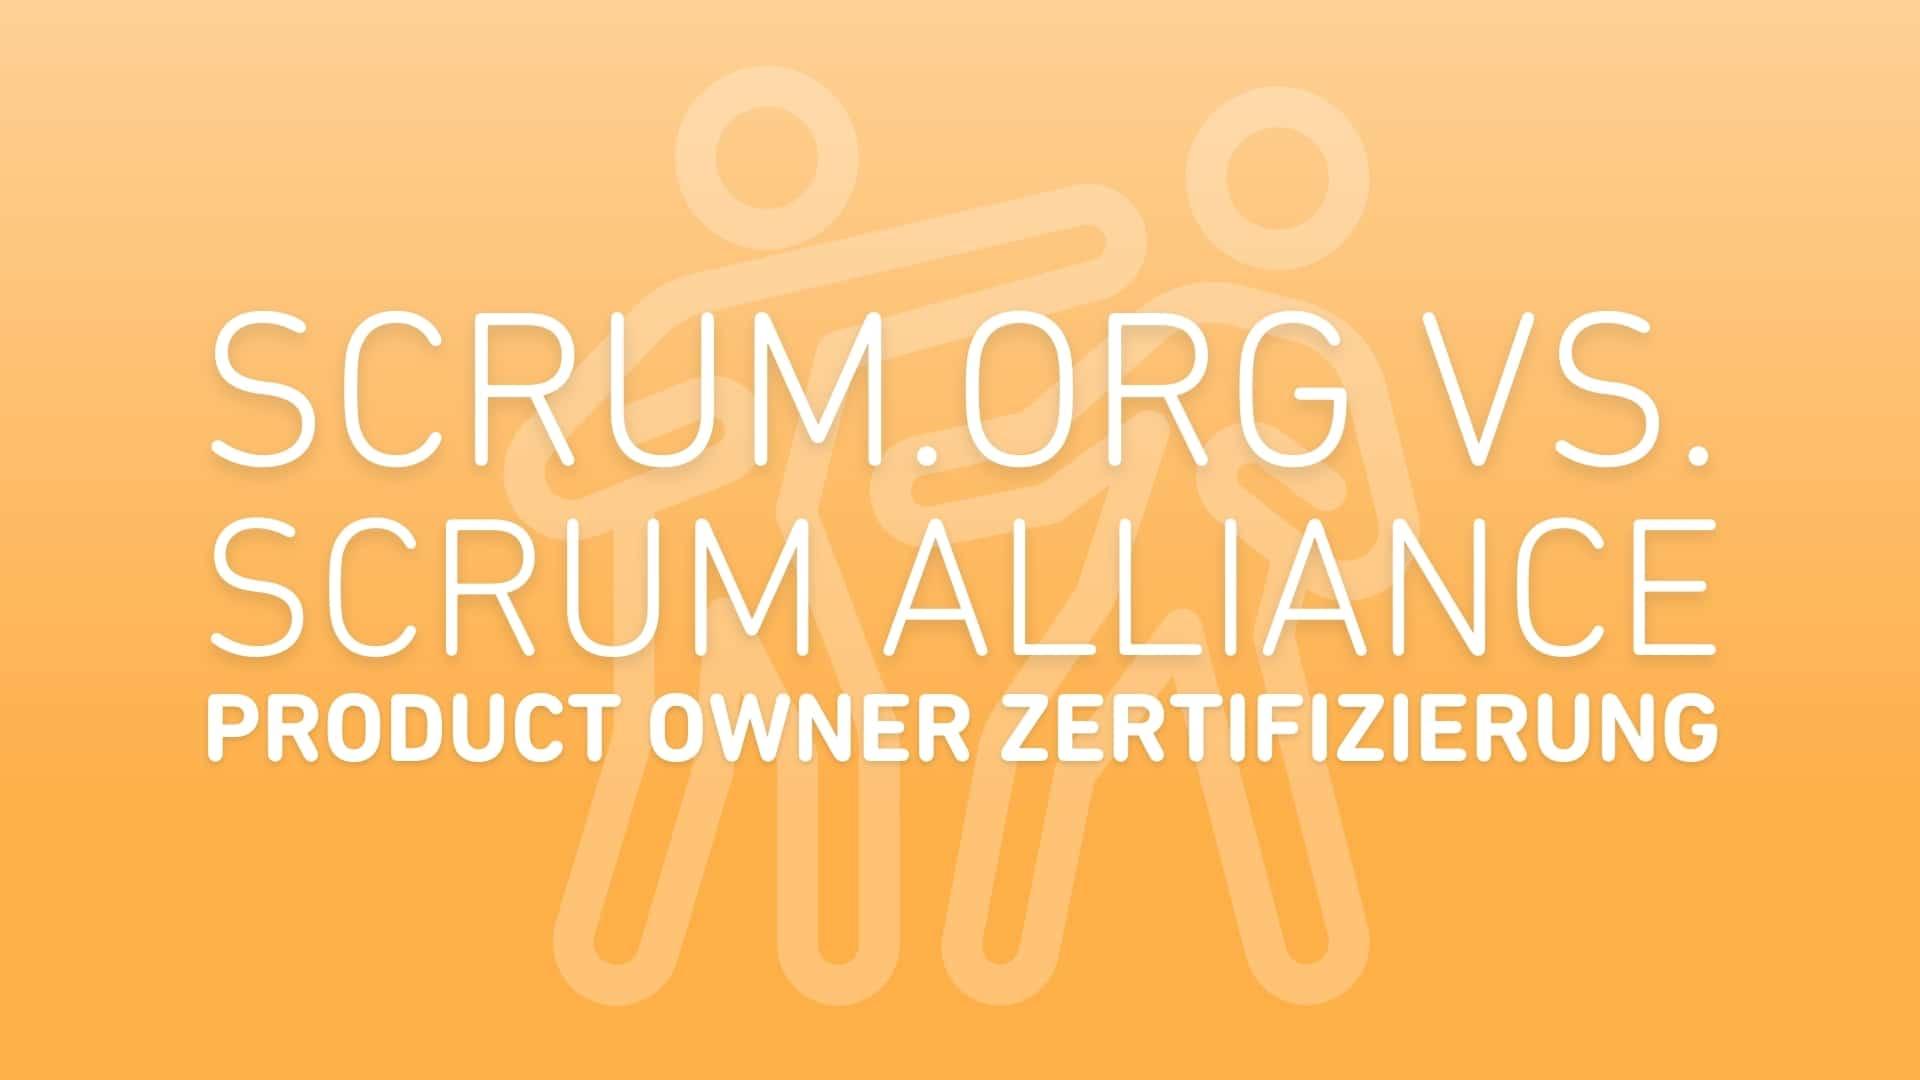 Scrum-org-vs-Scrum-Alliance-Product-Owner-Zertifizierung-im-Vergleich